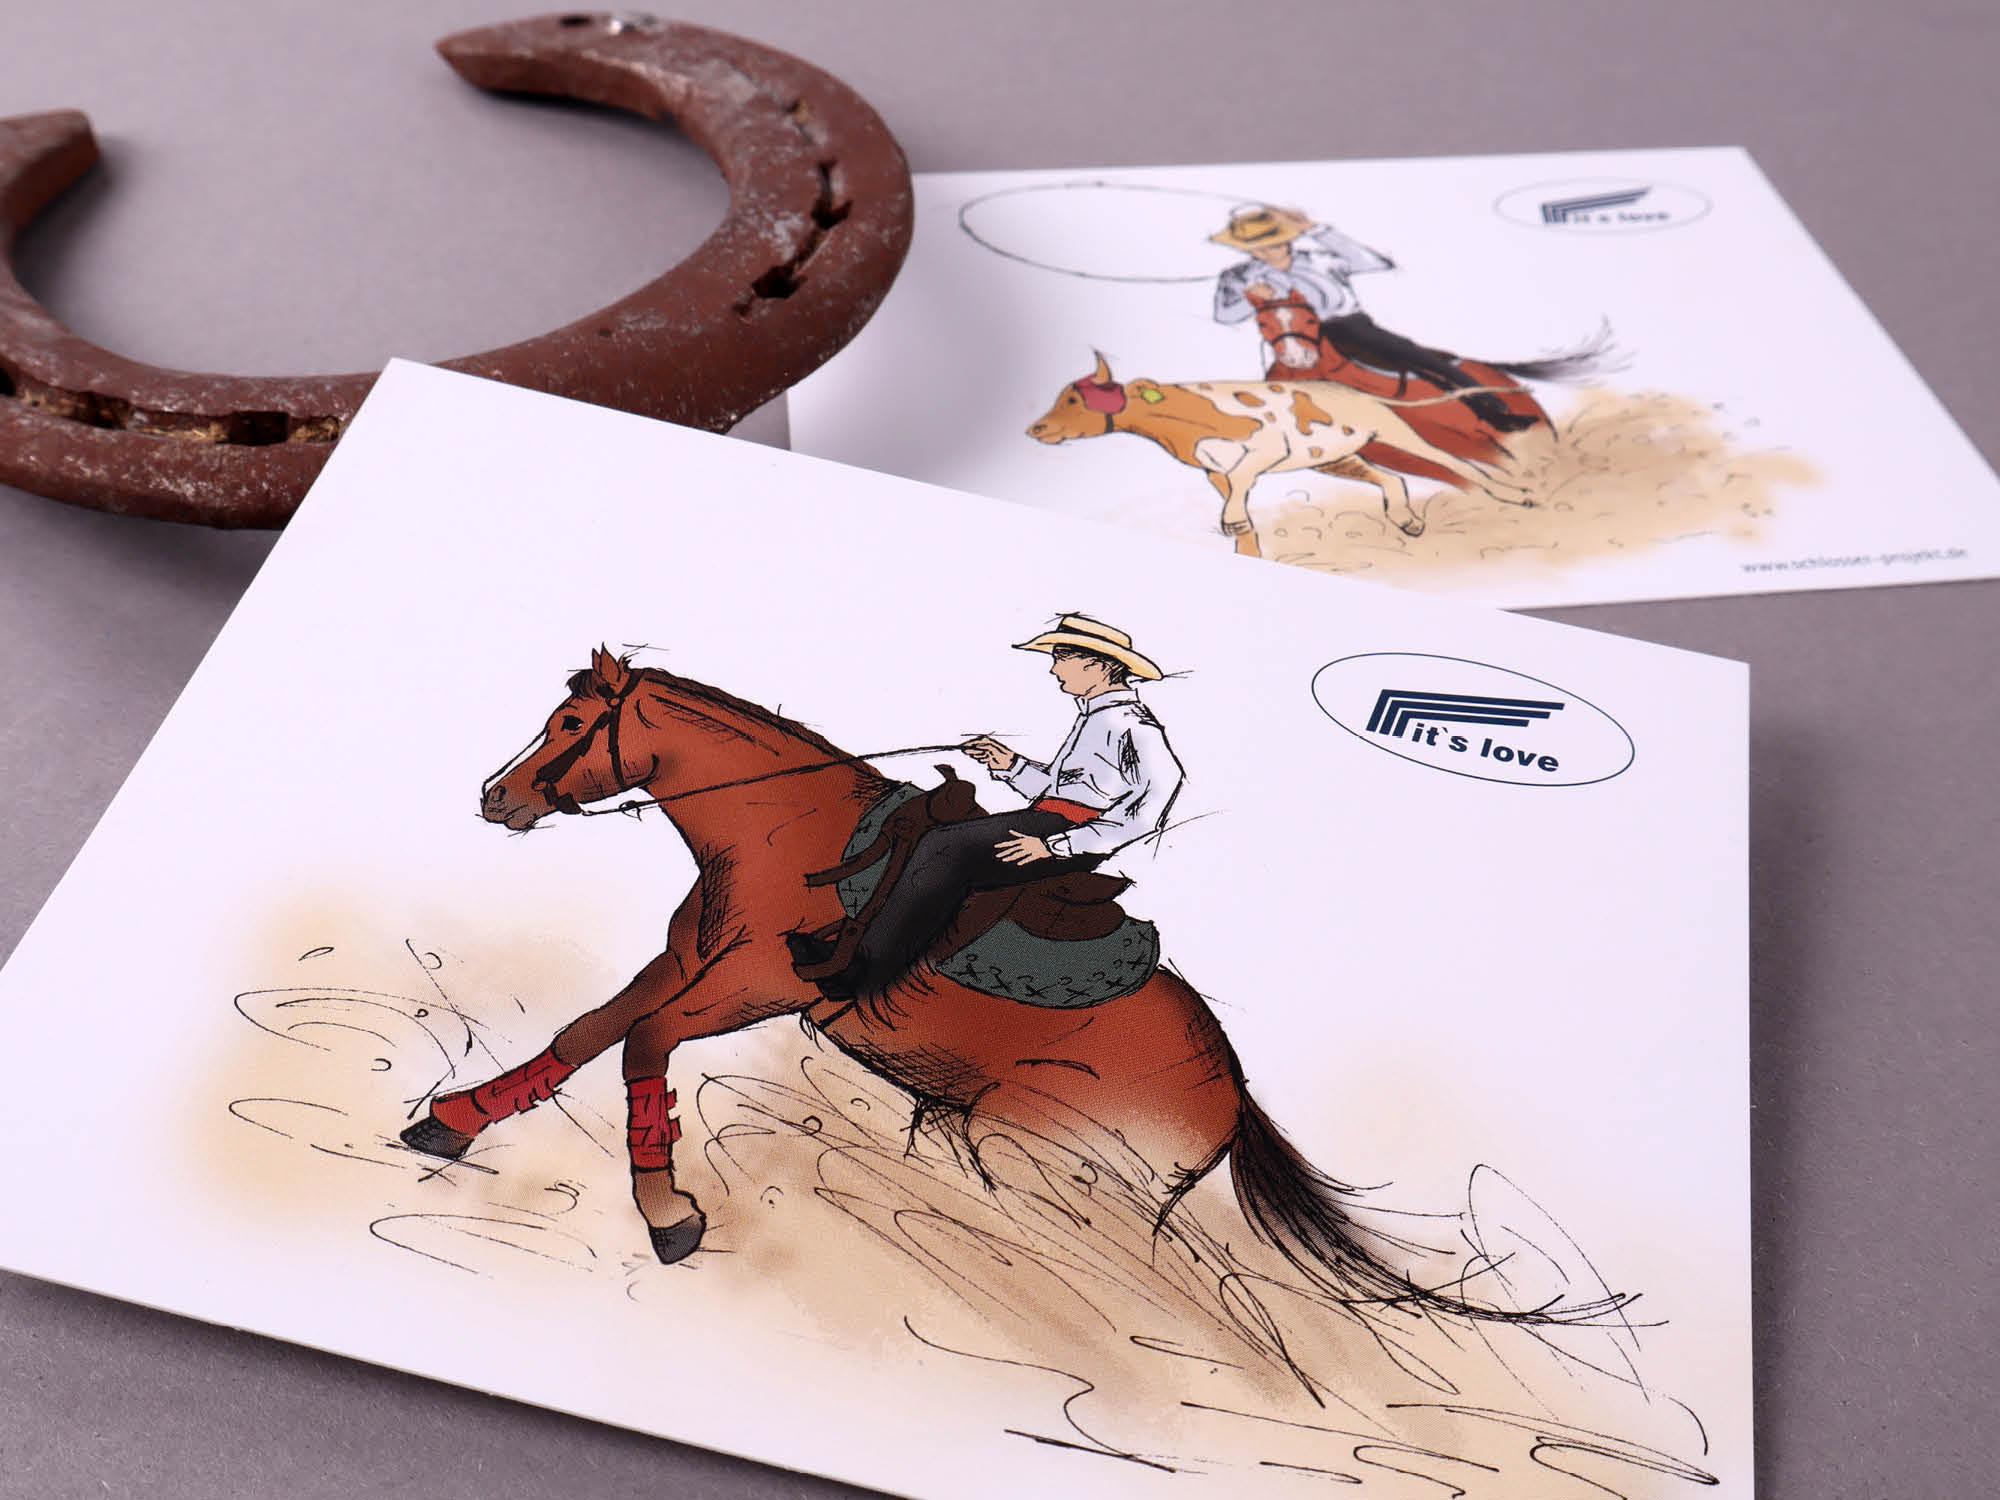 Schlosser - Jagstzell - Americana - Postkarten - 2019 - 01